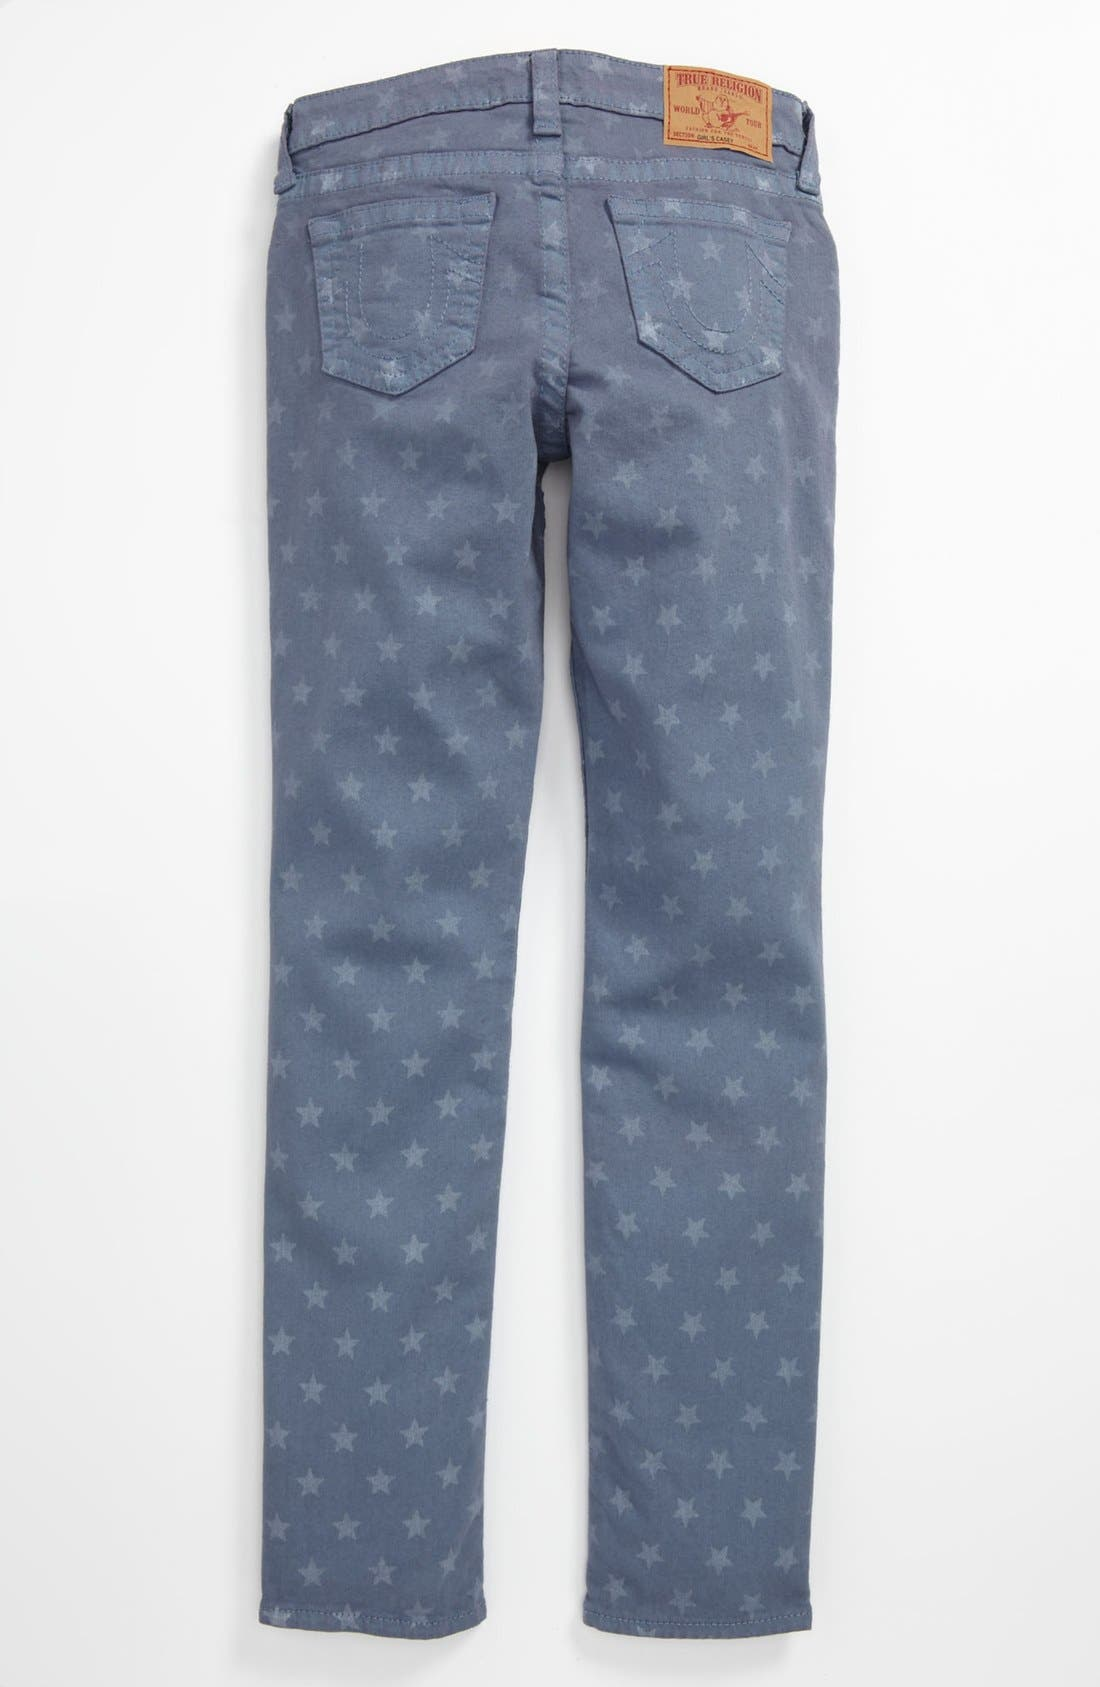 Main Image - True Religion Brand Jeans Skinny Leg Jeans (Big Girls)